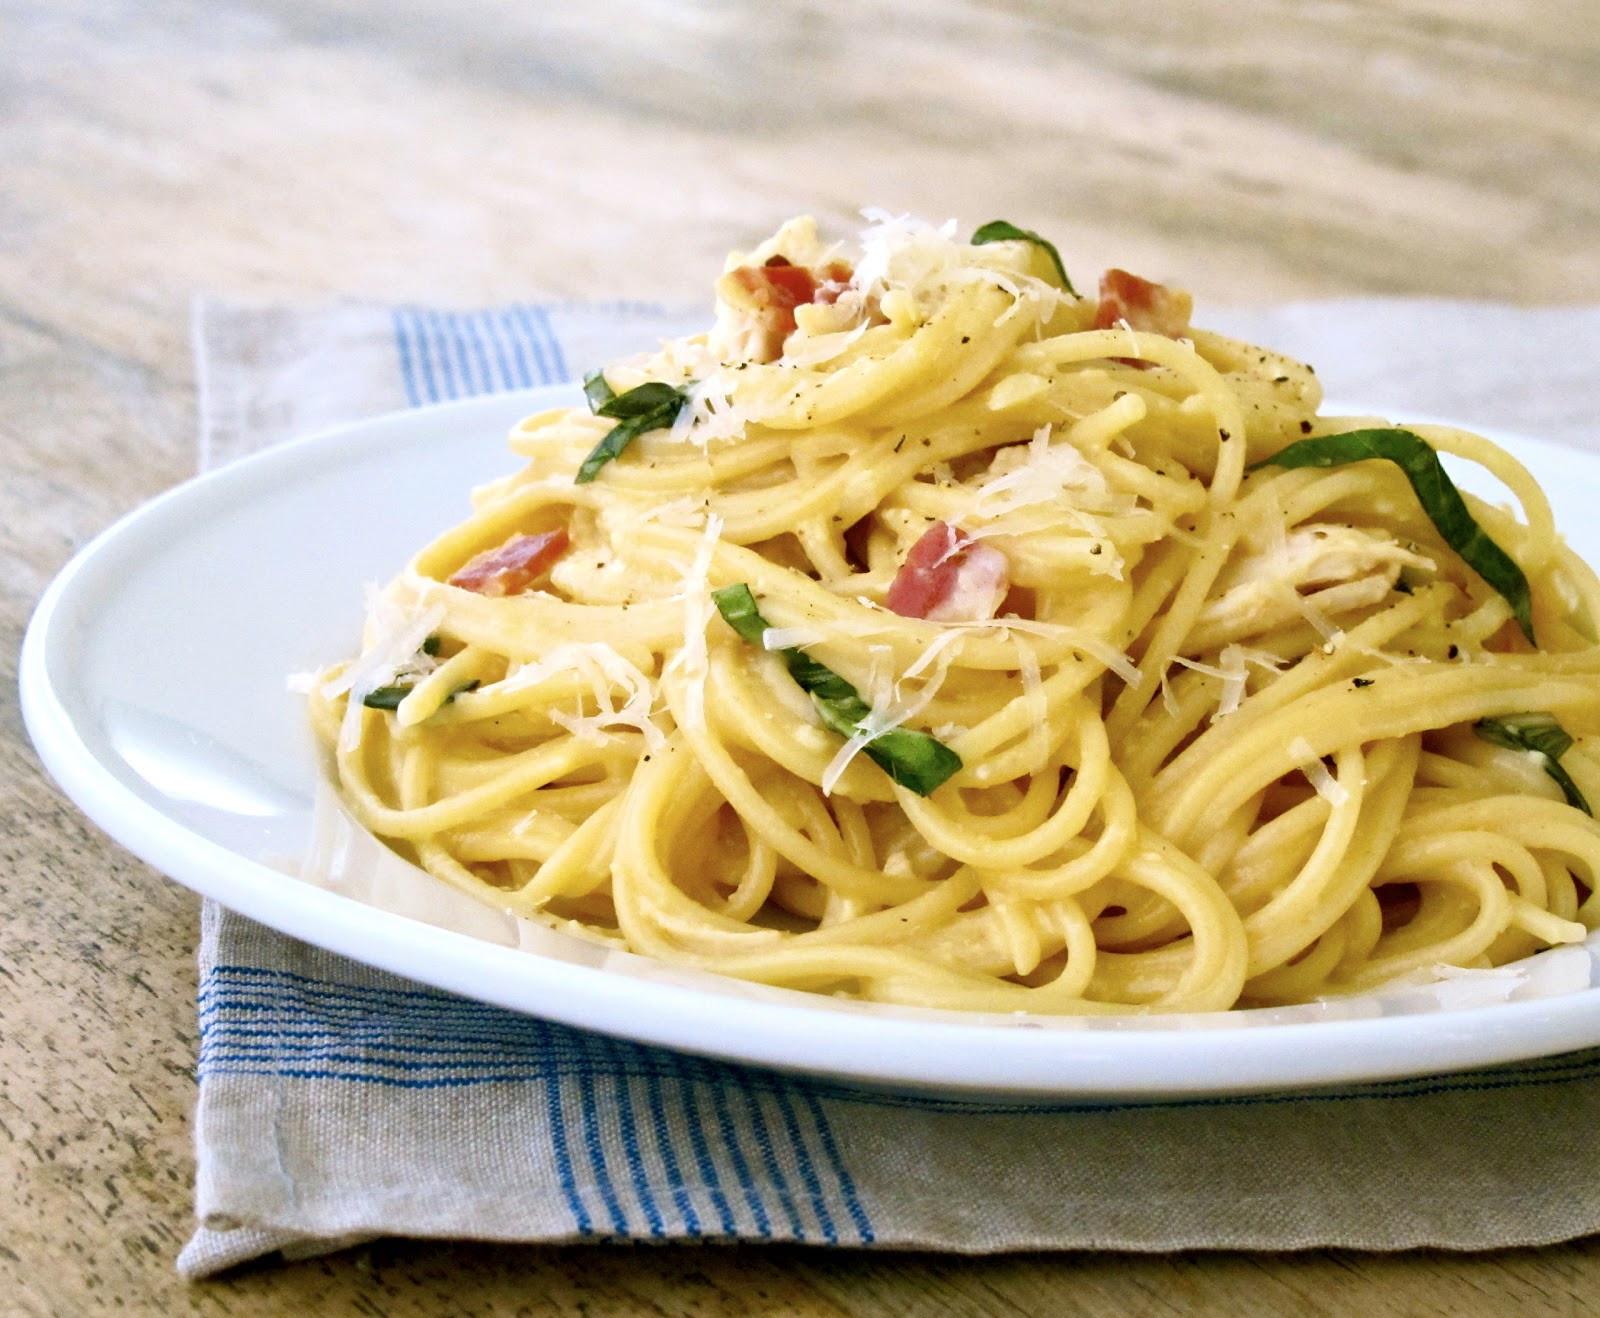 Pasta Dishes For Dinner  Jenny Steffens Hobick Chicken Carbonara